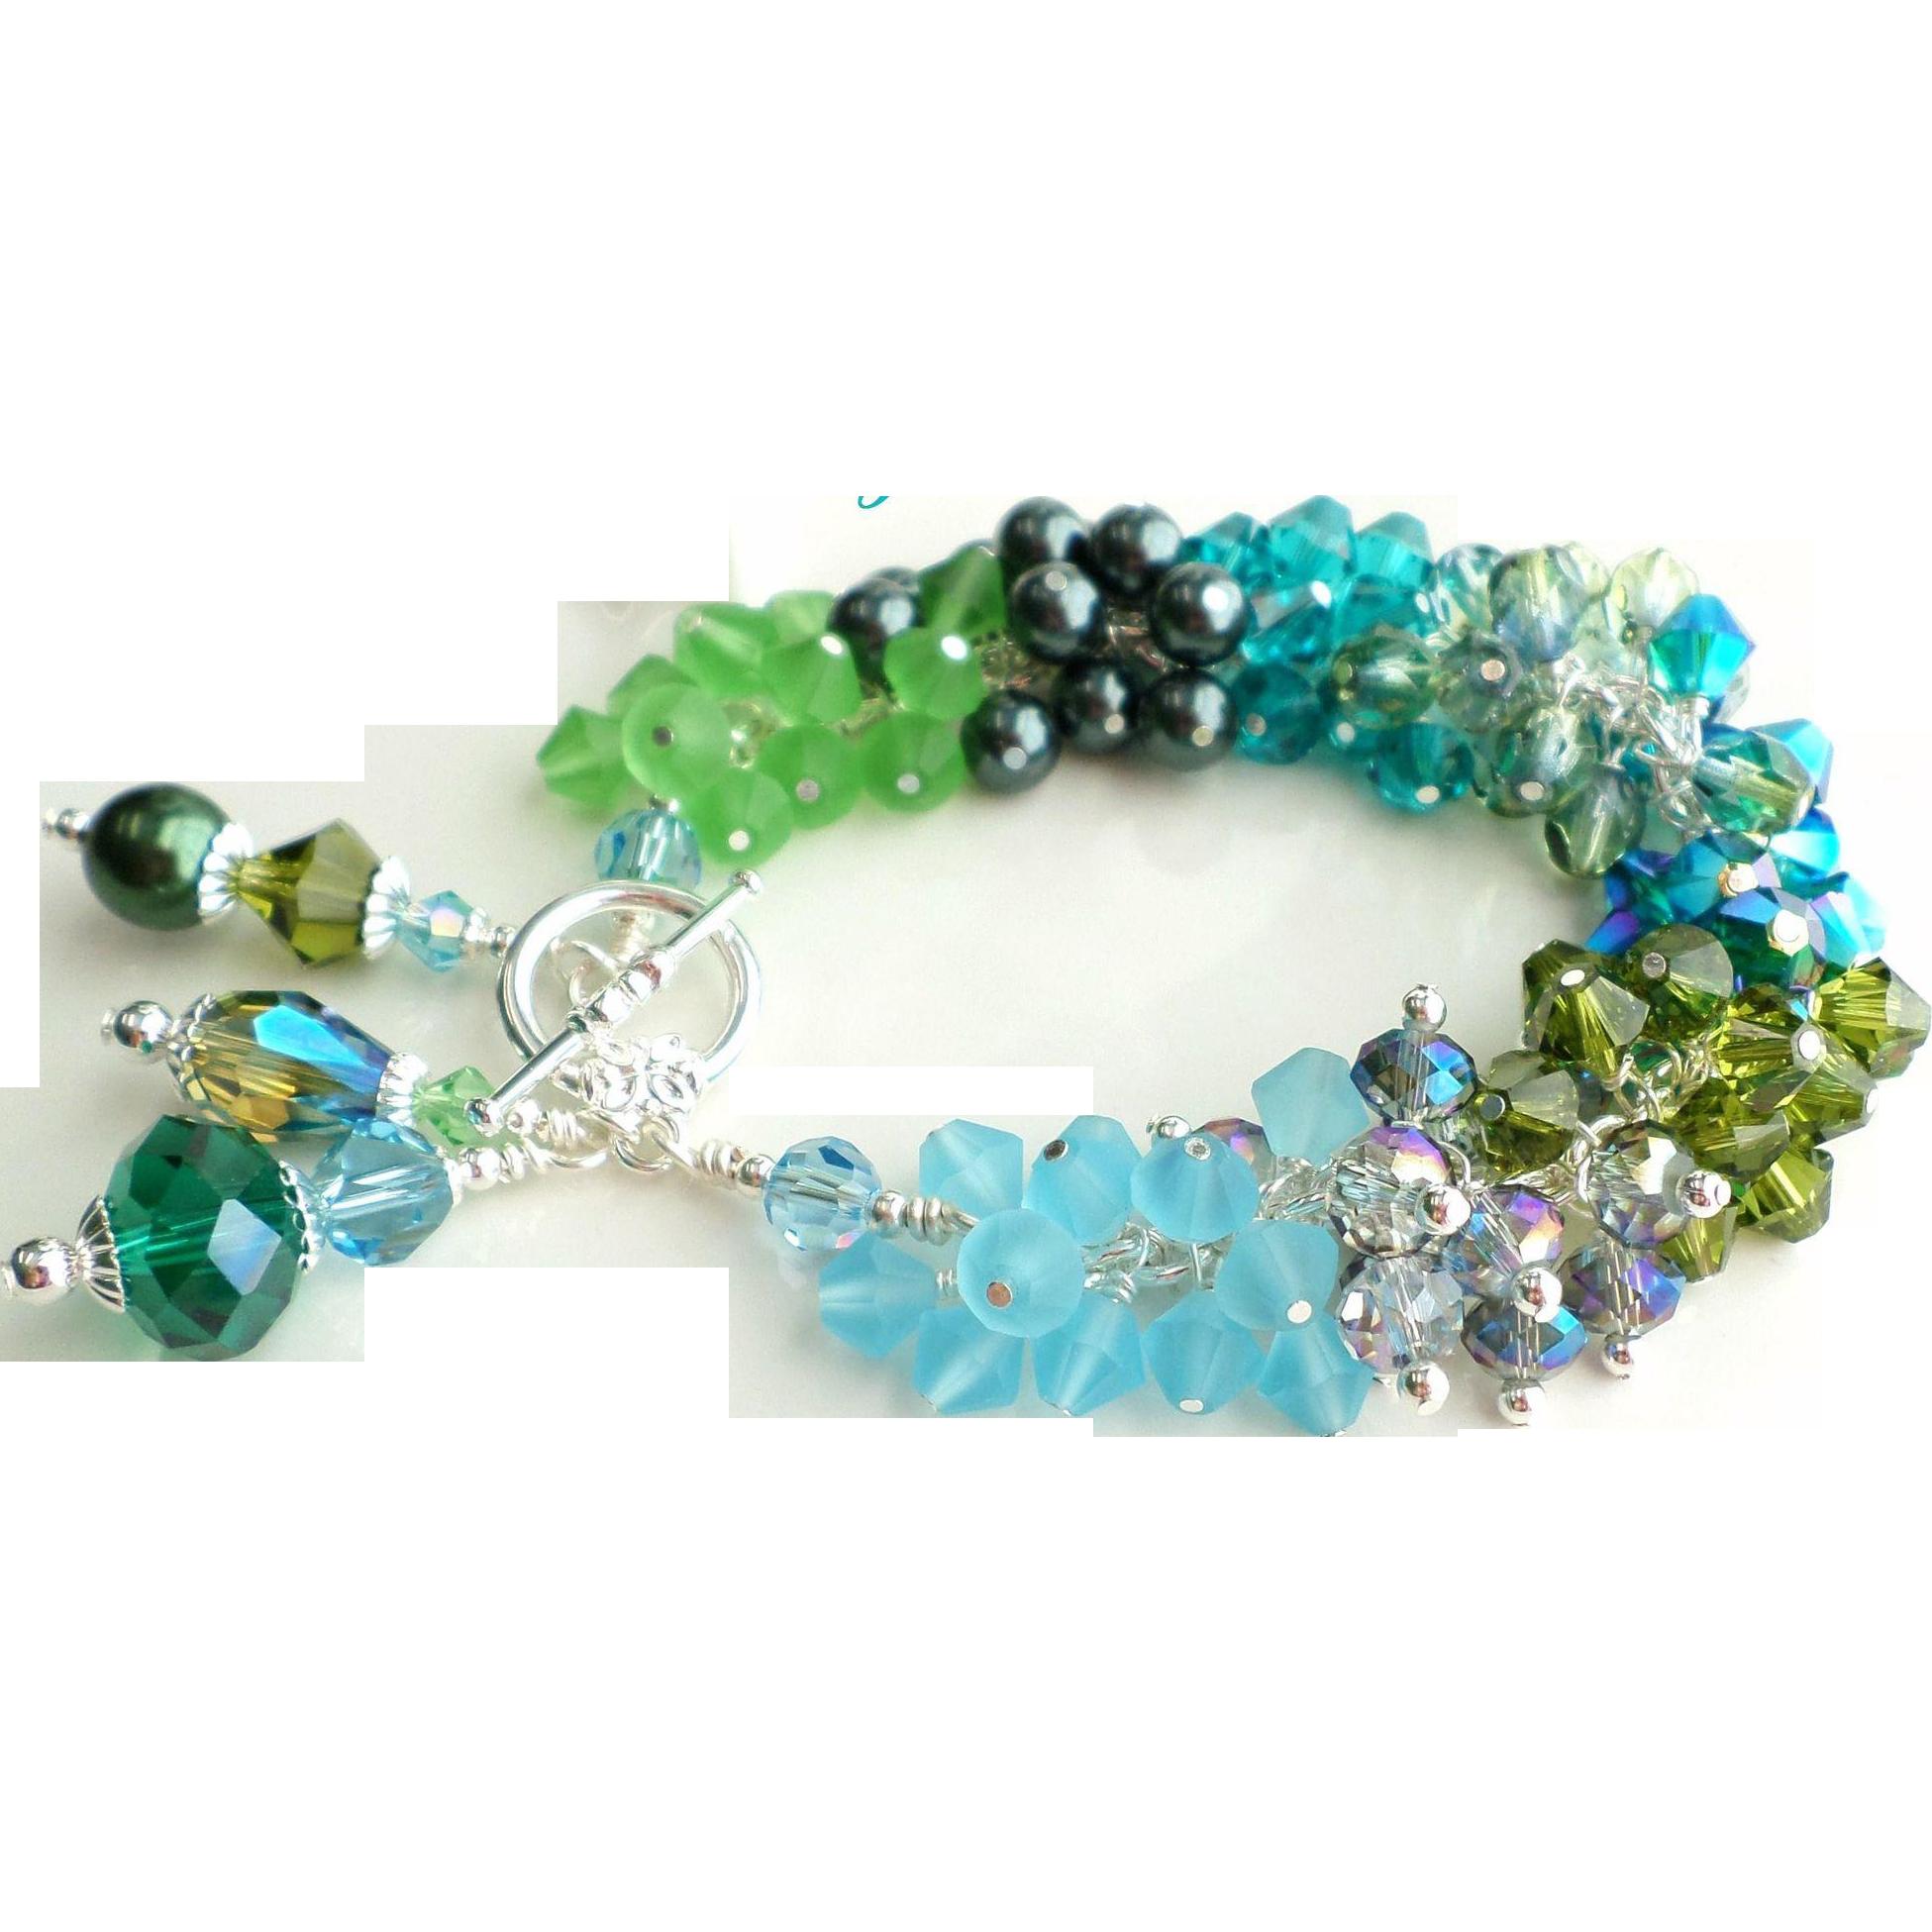 Beach Themed Blue and Green Shades Swarovski Crystals Charm Bracelet